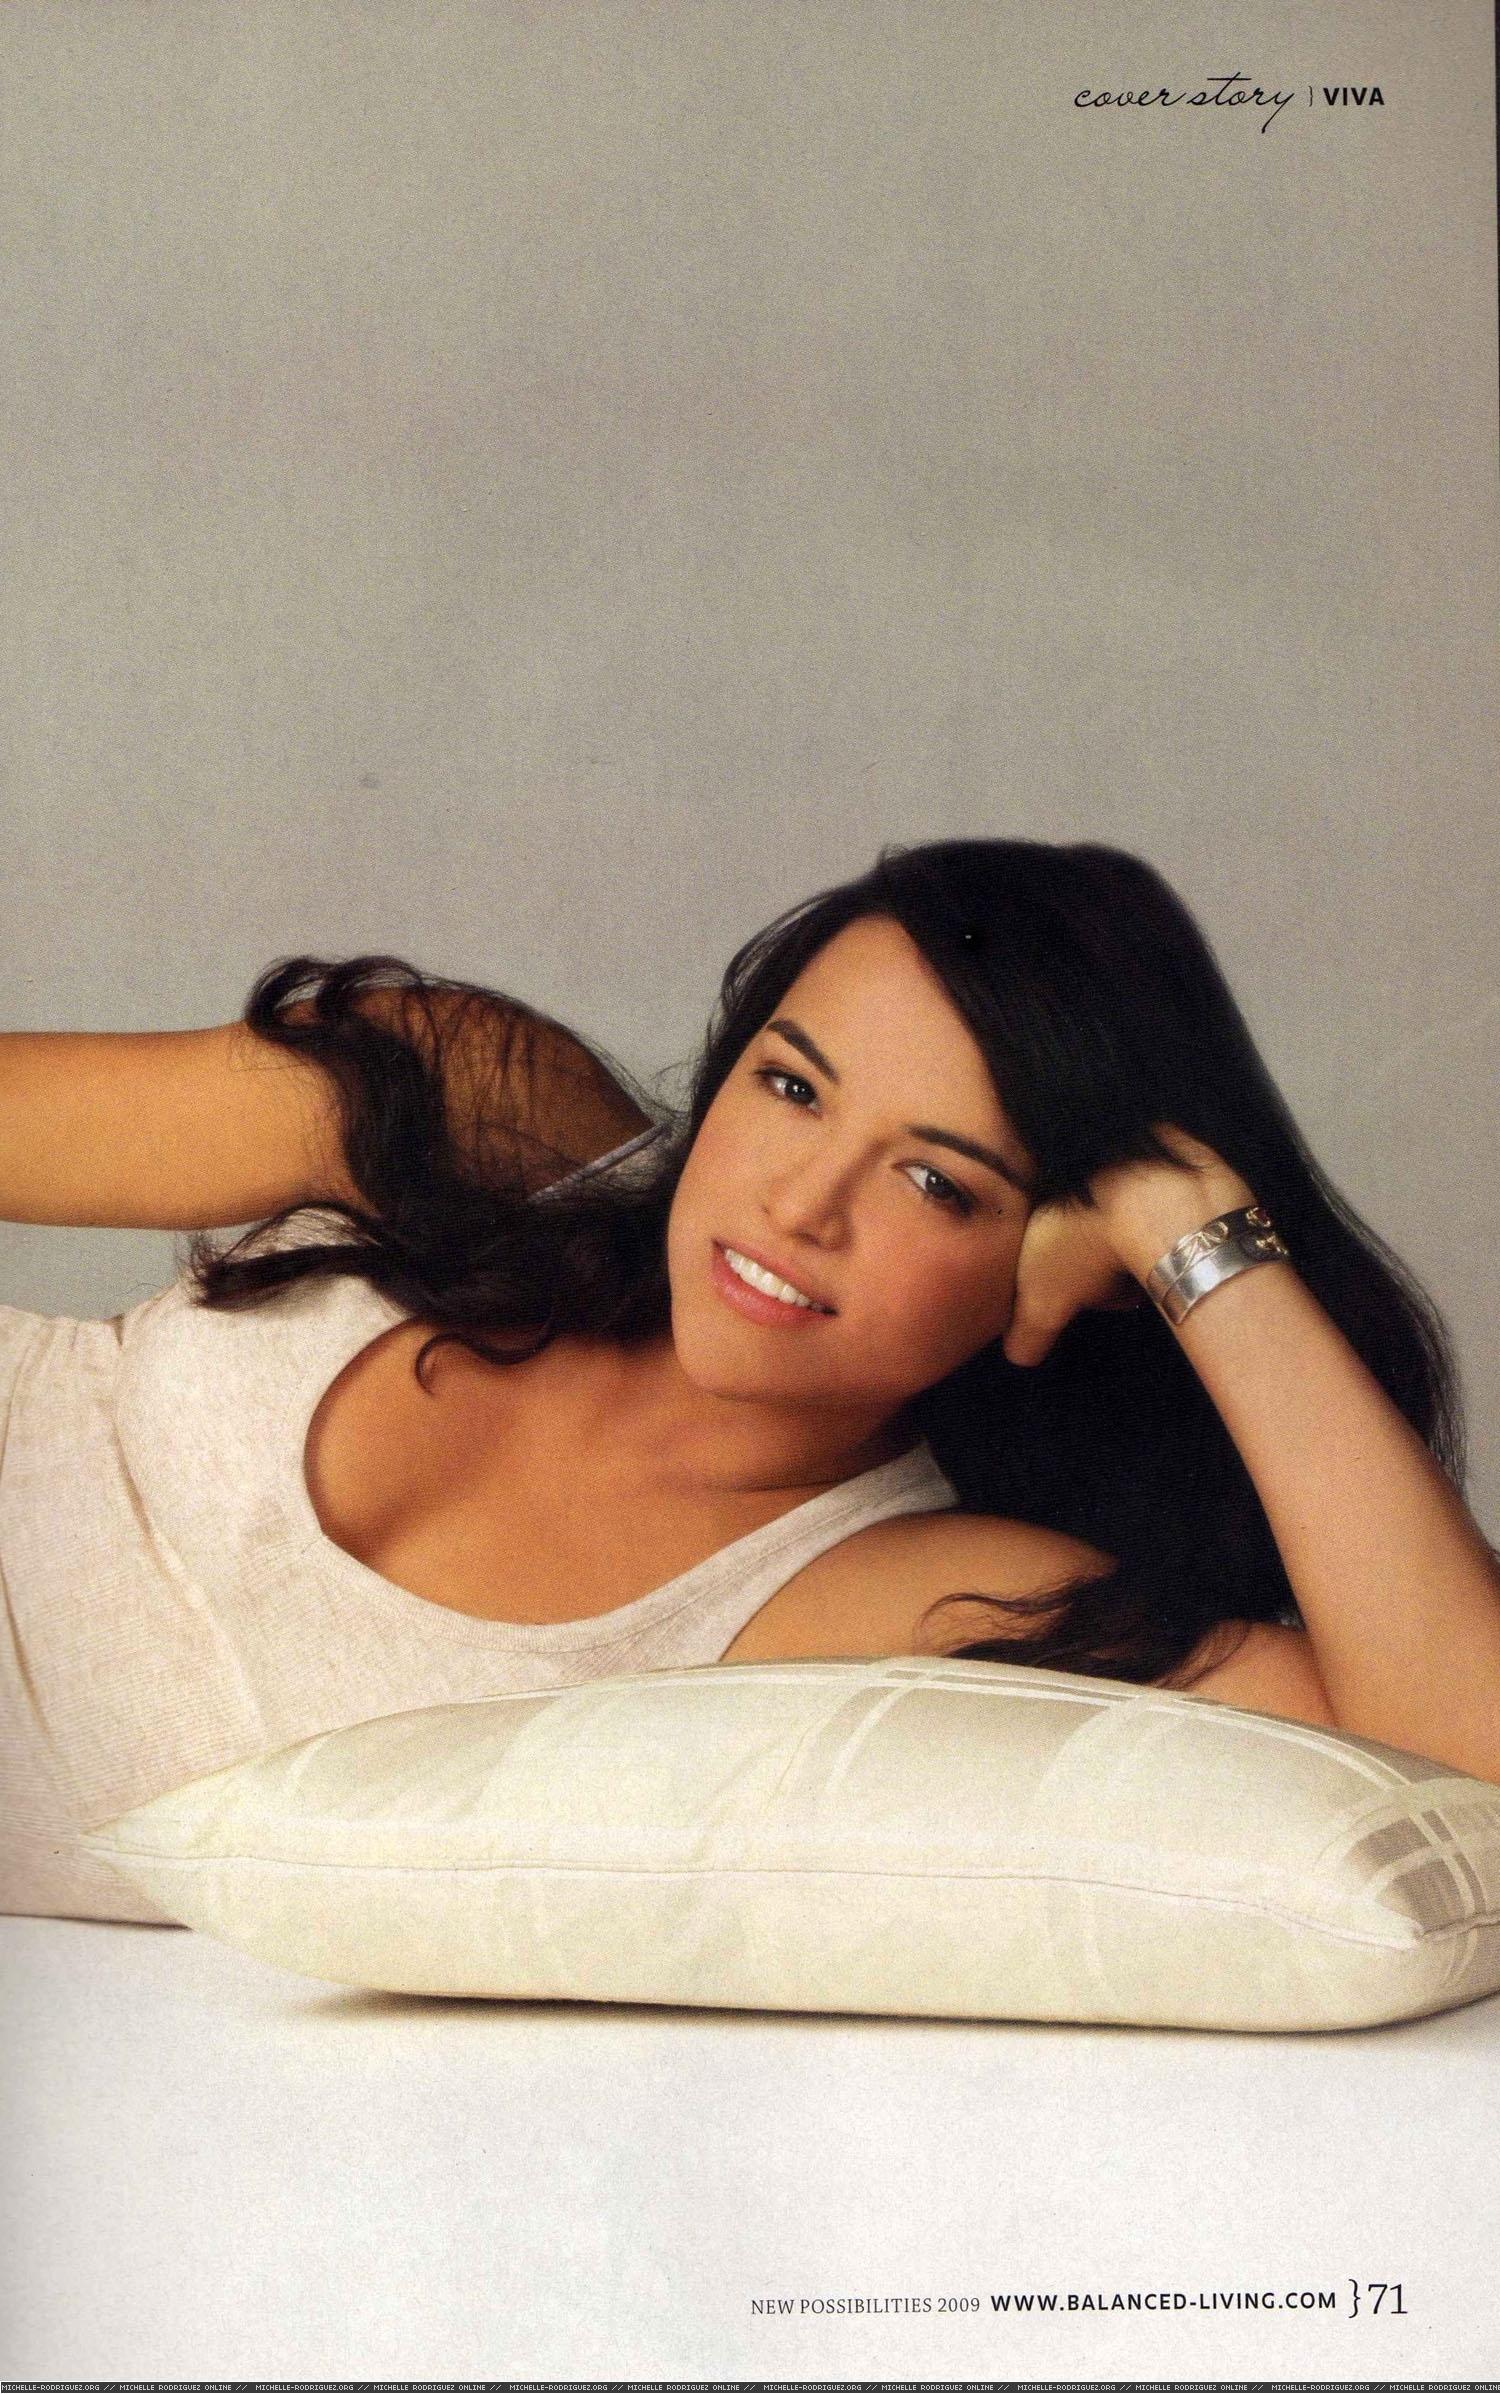 Michelle in Viva Magazine [4]